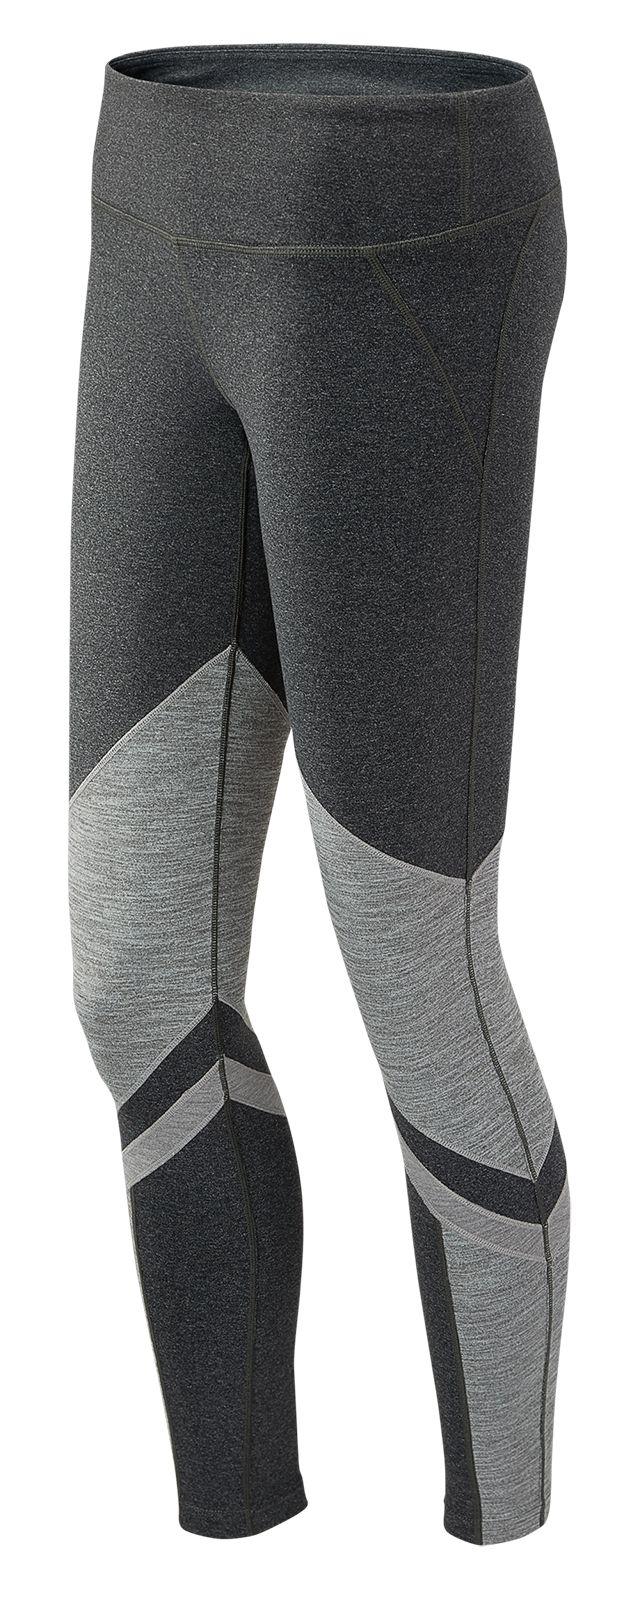 Women's J.Crew Premium Performance Glass Legging